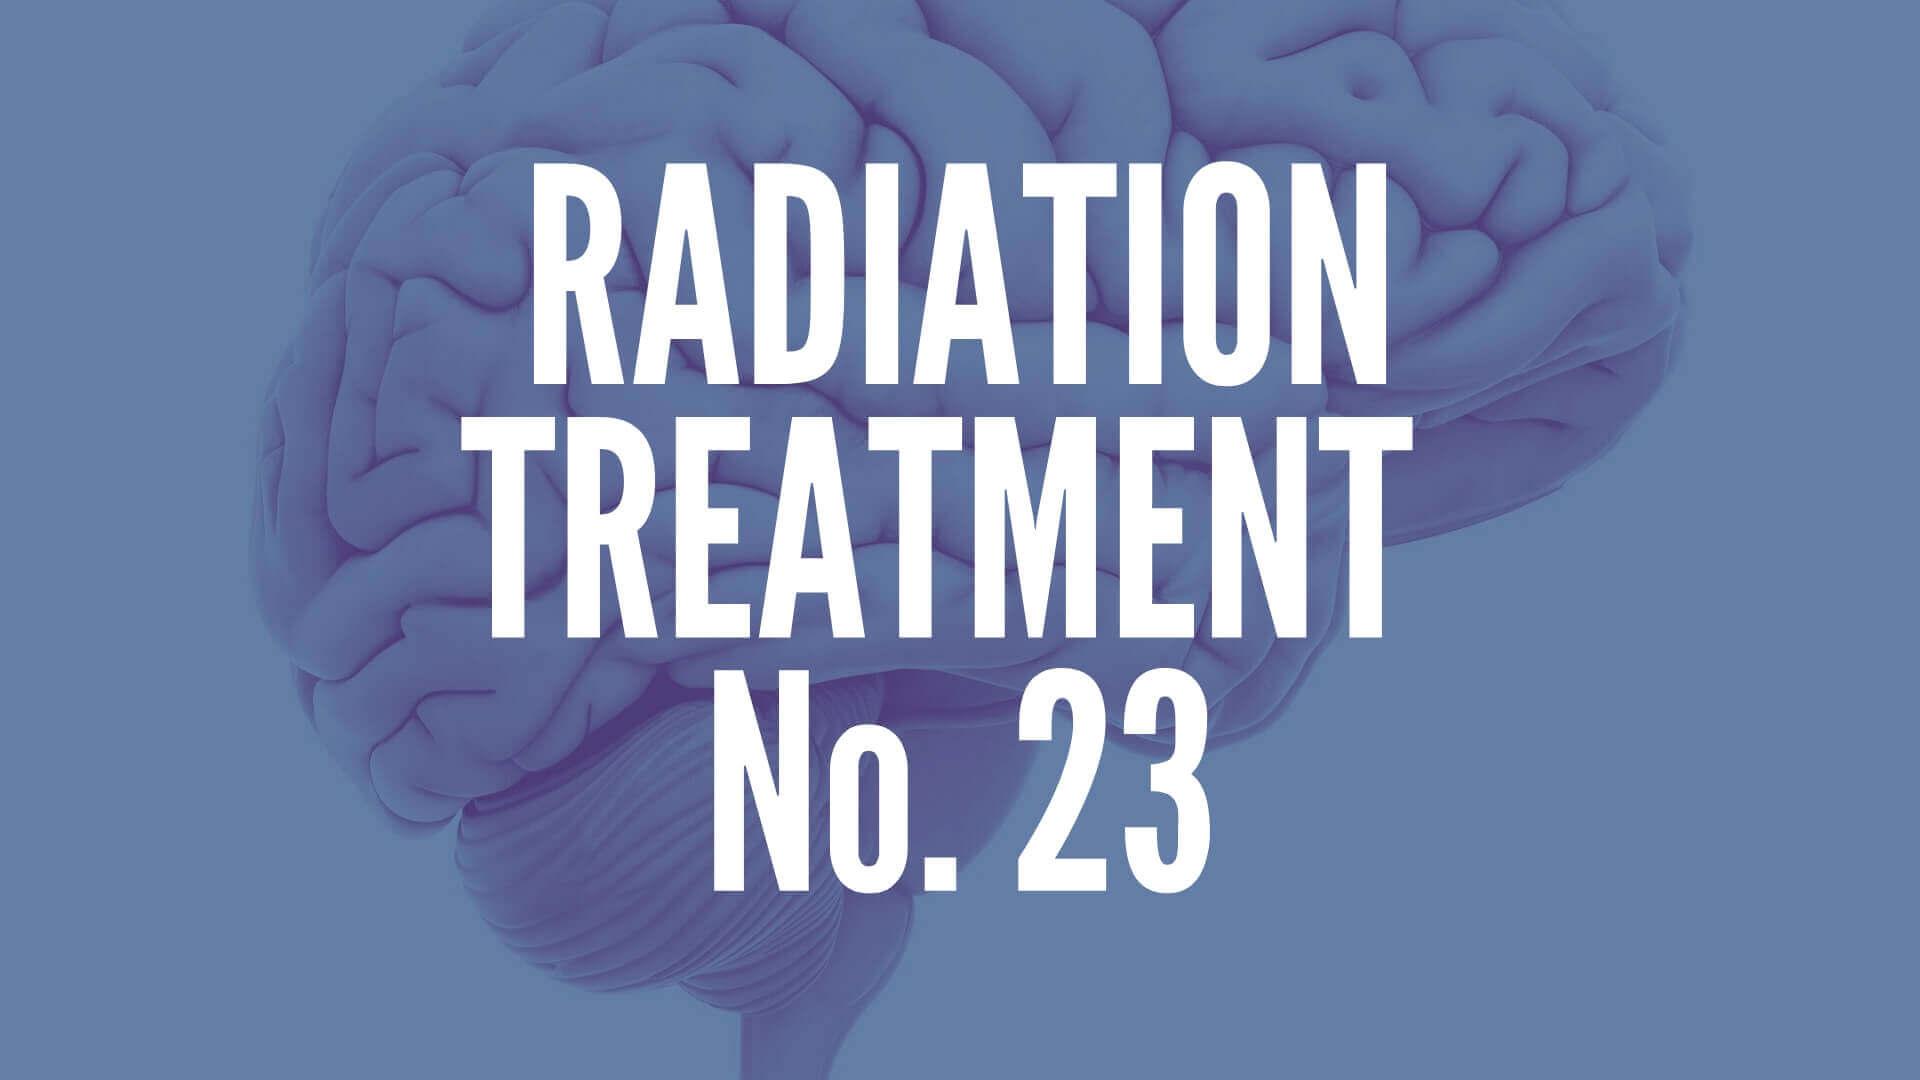 Brain Tumor Radiation Treatment 23